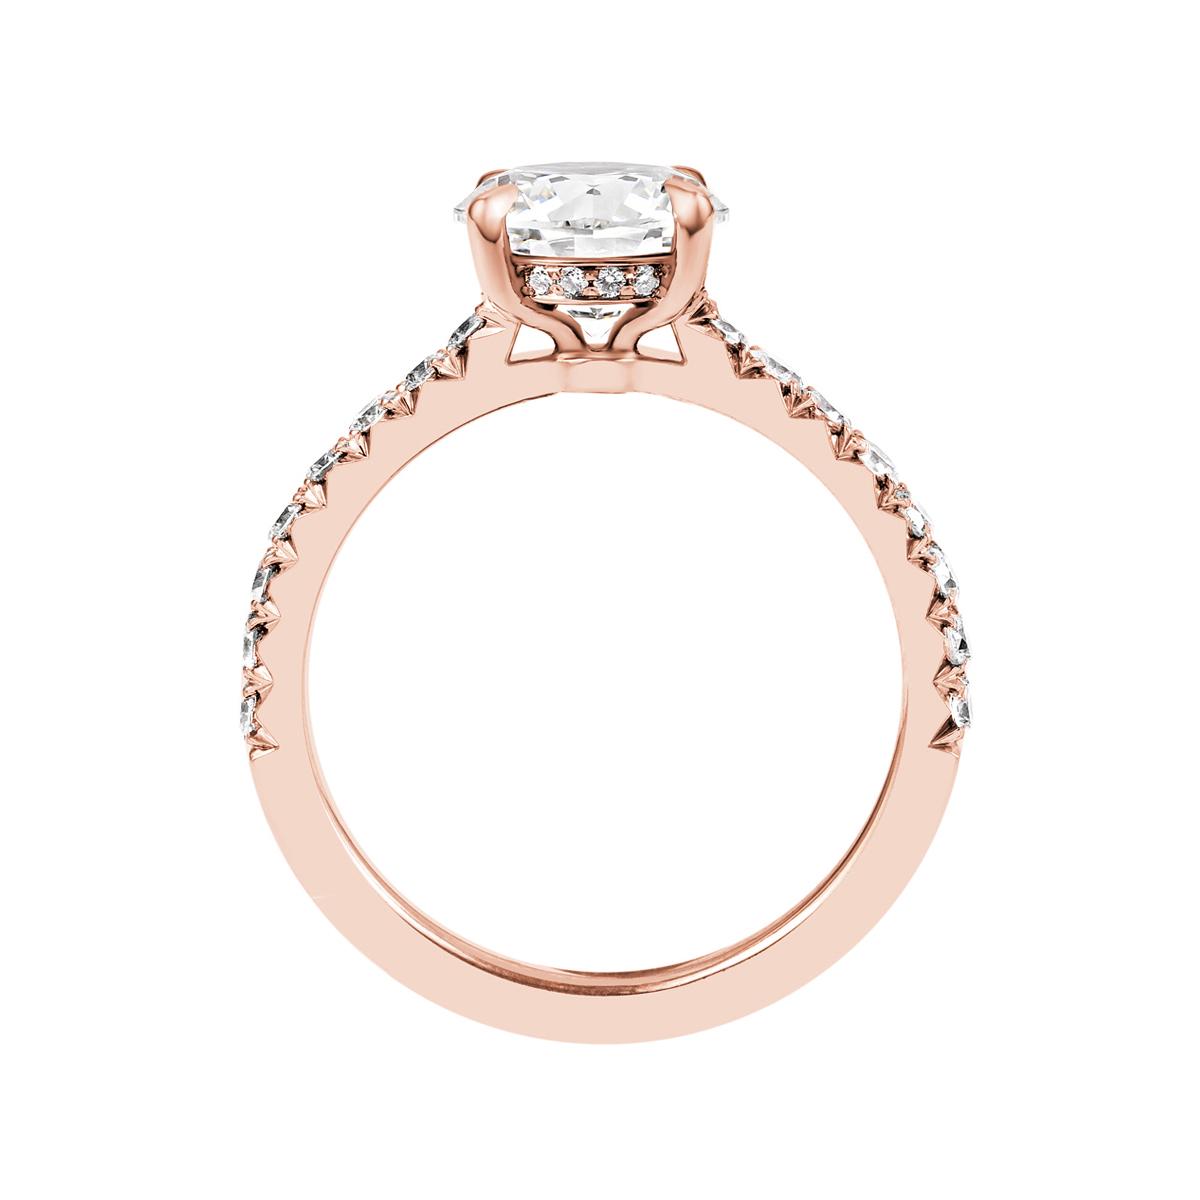 Round-frances-rose-gold-diamond-set-engagement-ring-profile.jpg